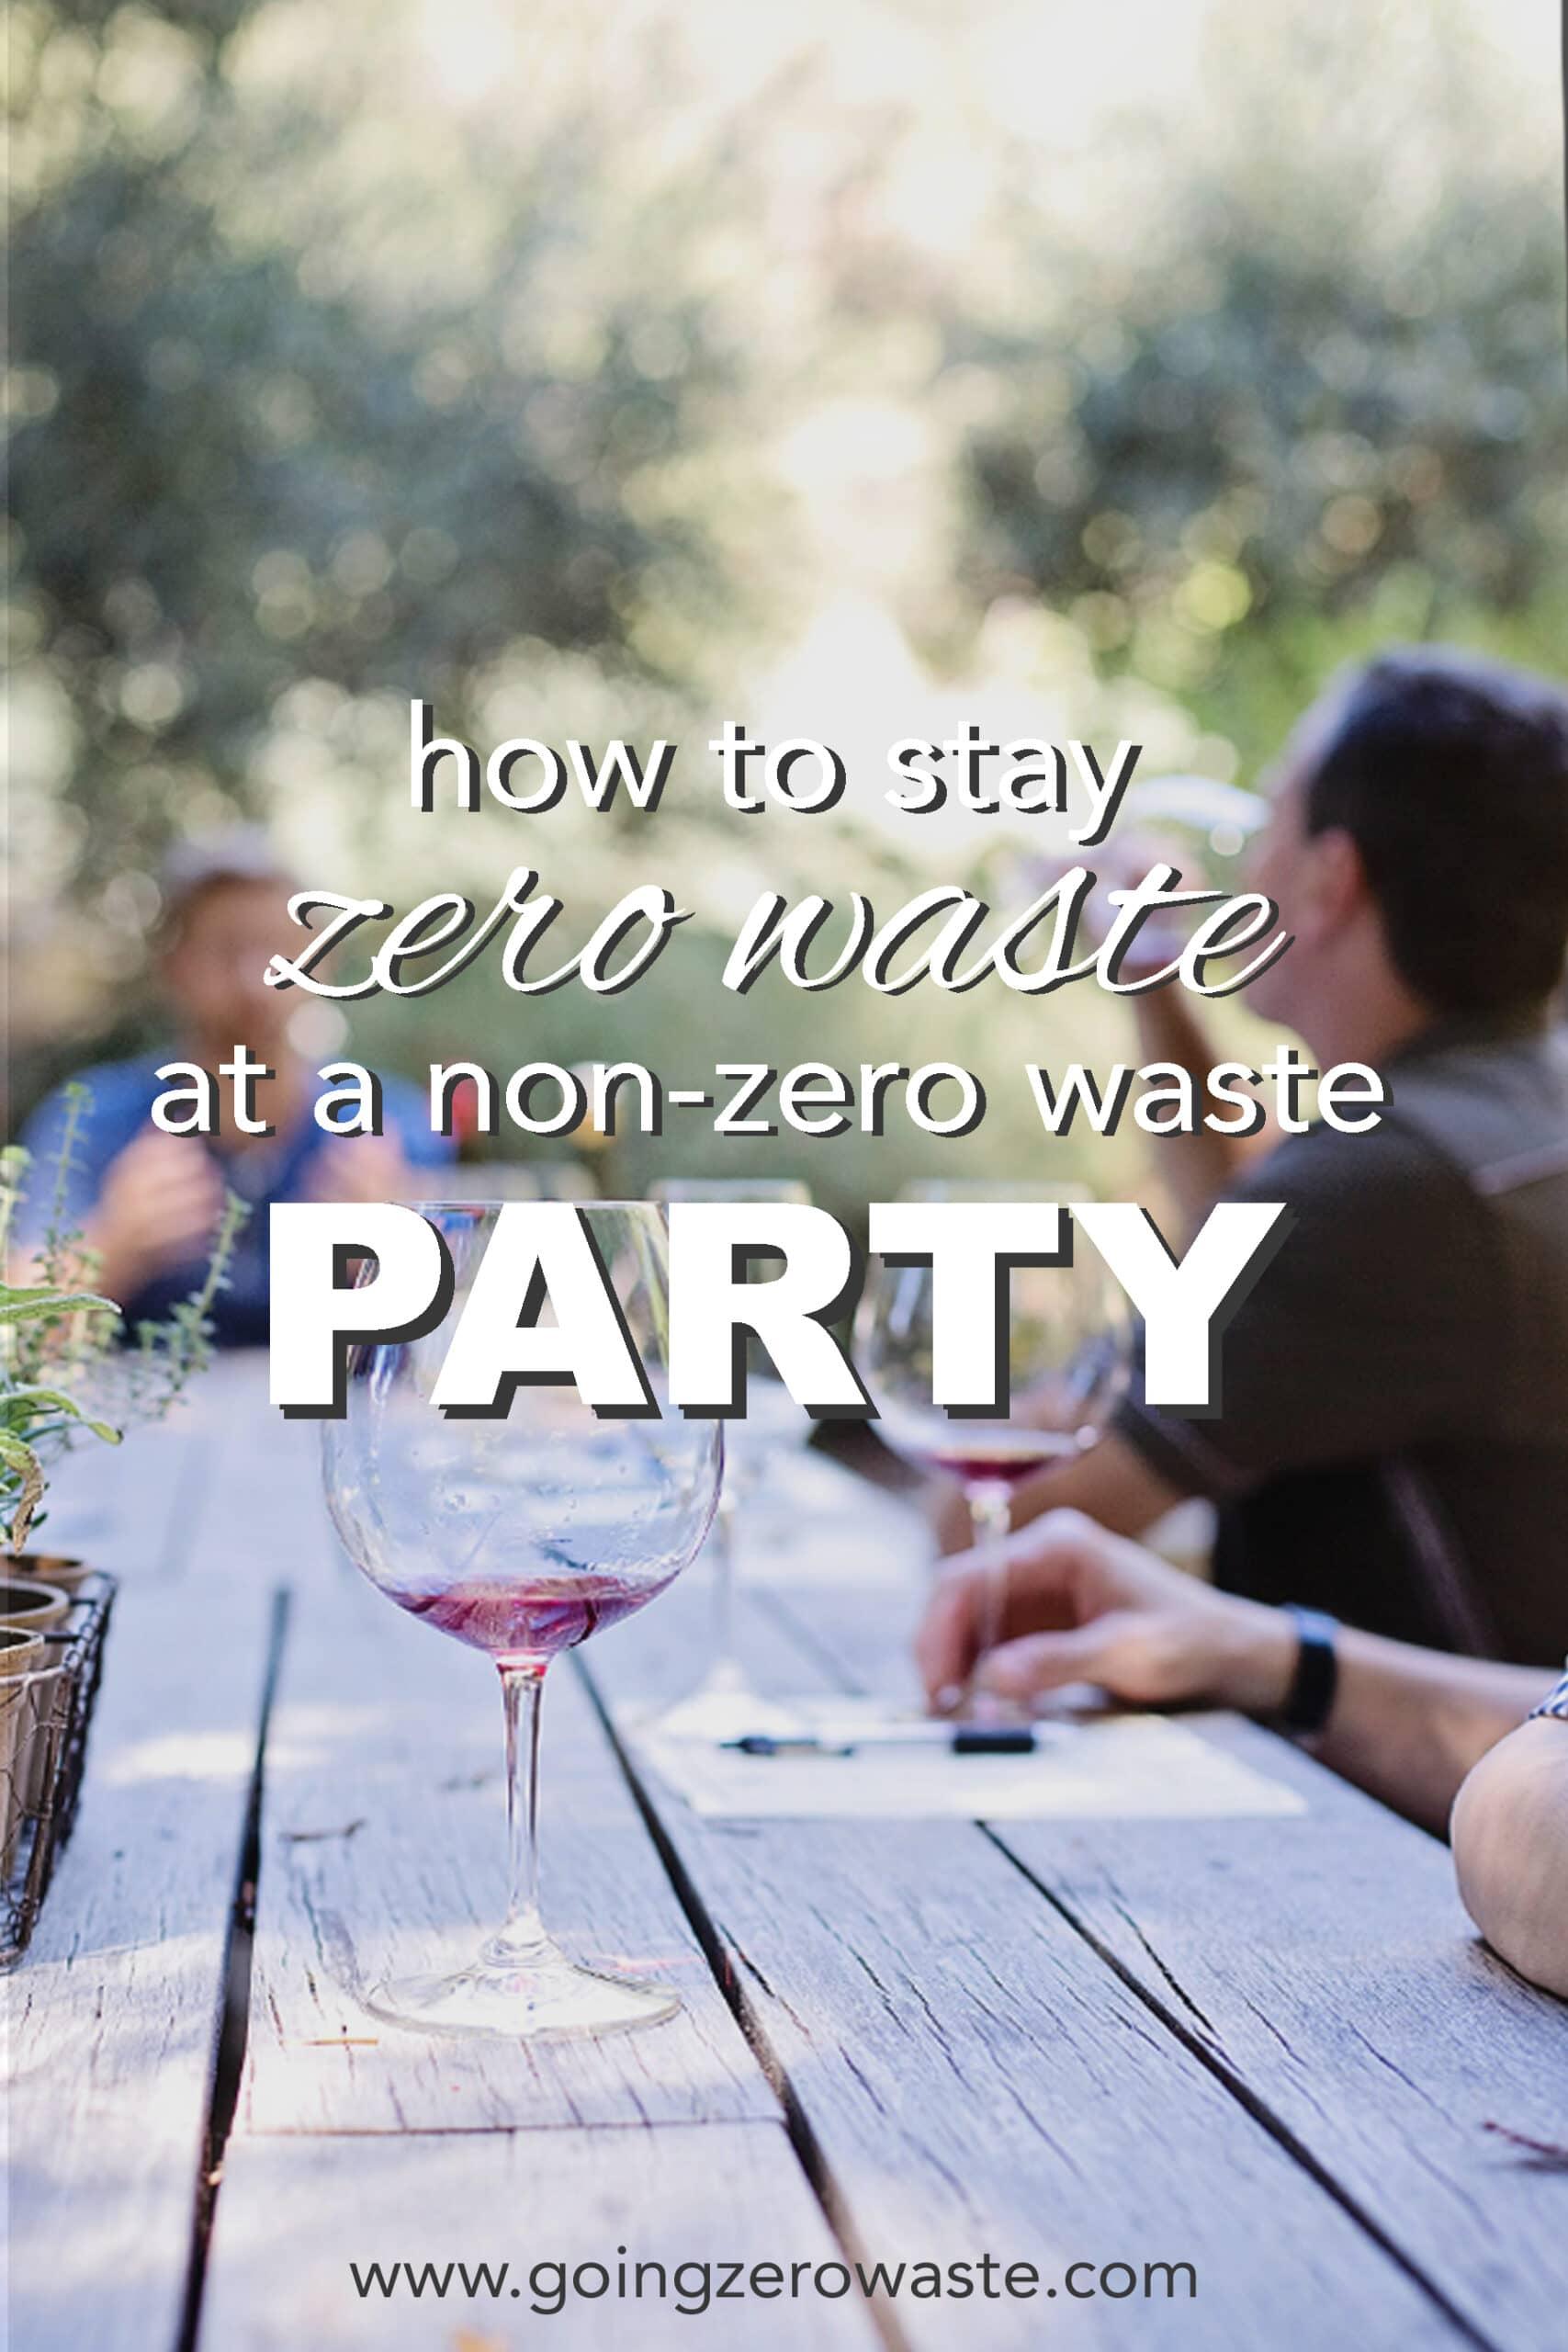 How to Stay Zero Waste at a Non-Zero Waste Party